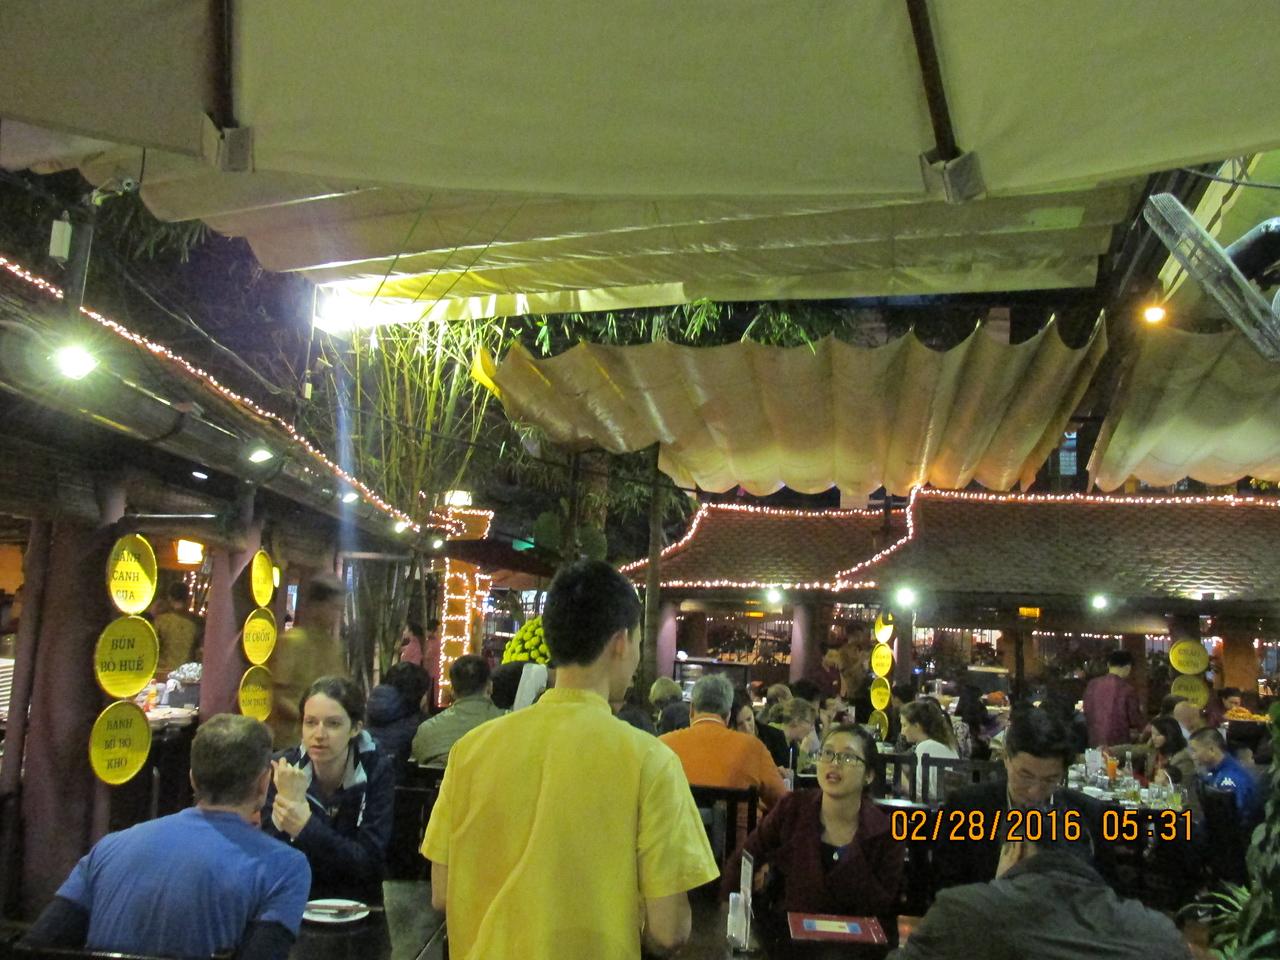 0066 - Quan An Ngon Restaurant on Phan Boi Chau - Hanoi Vietnam - Date Correct but Time on Pic is Wrong